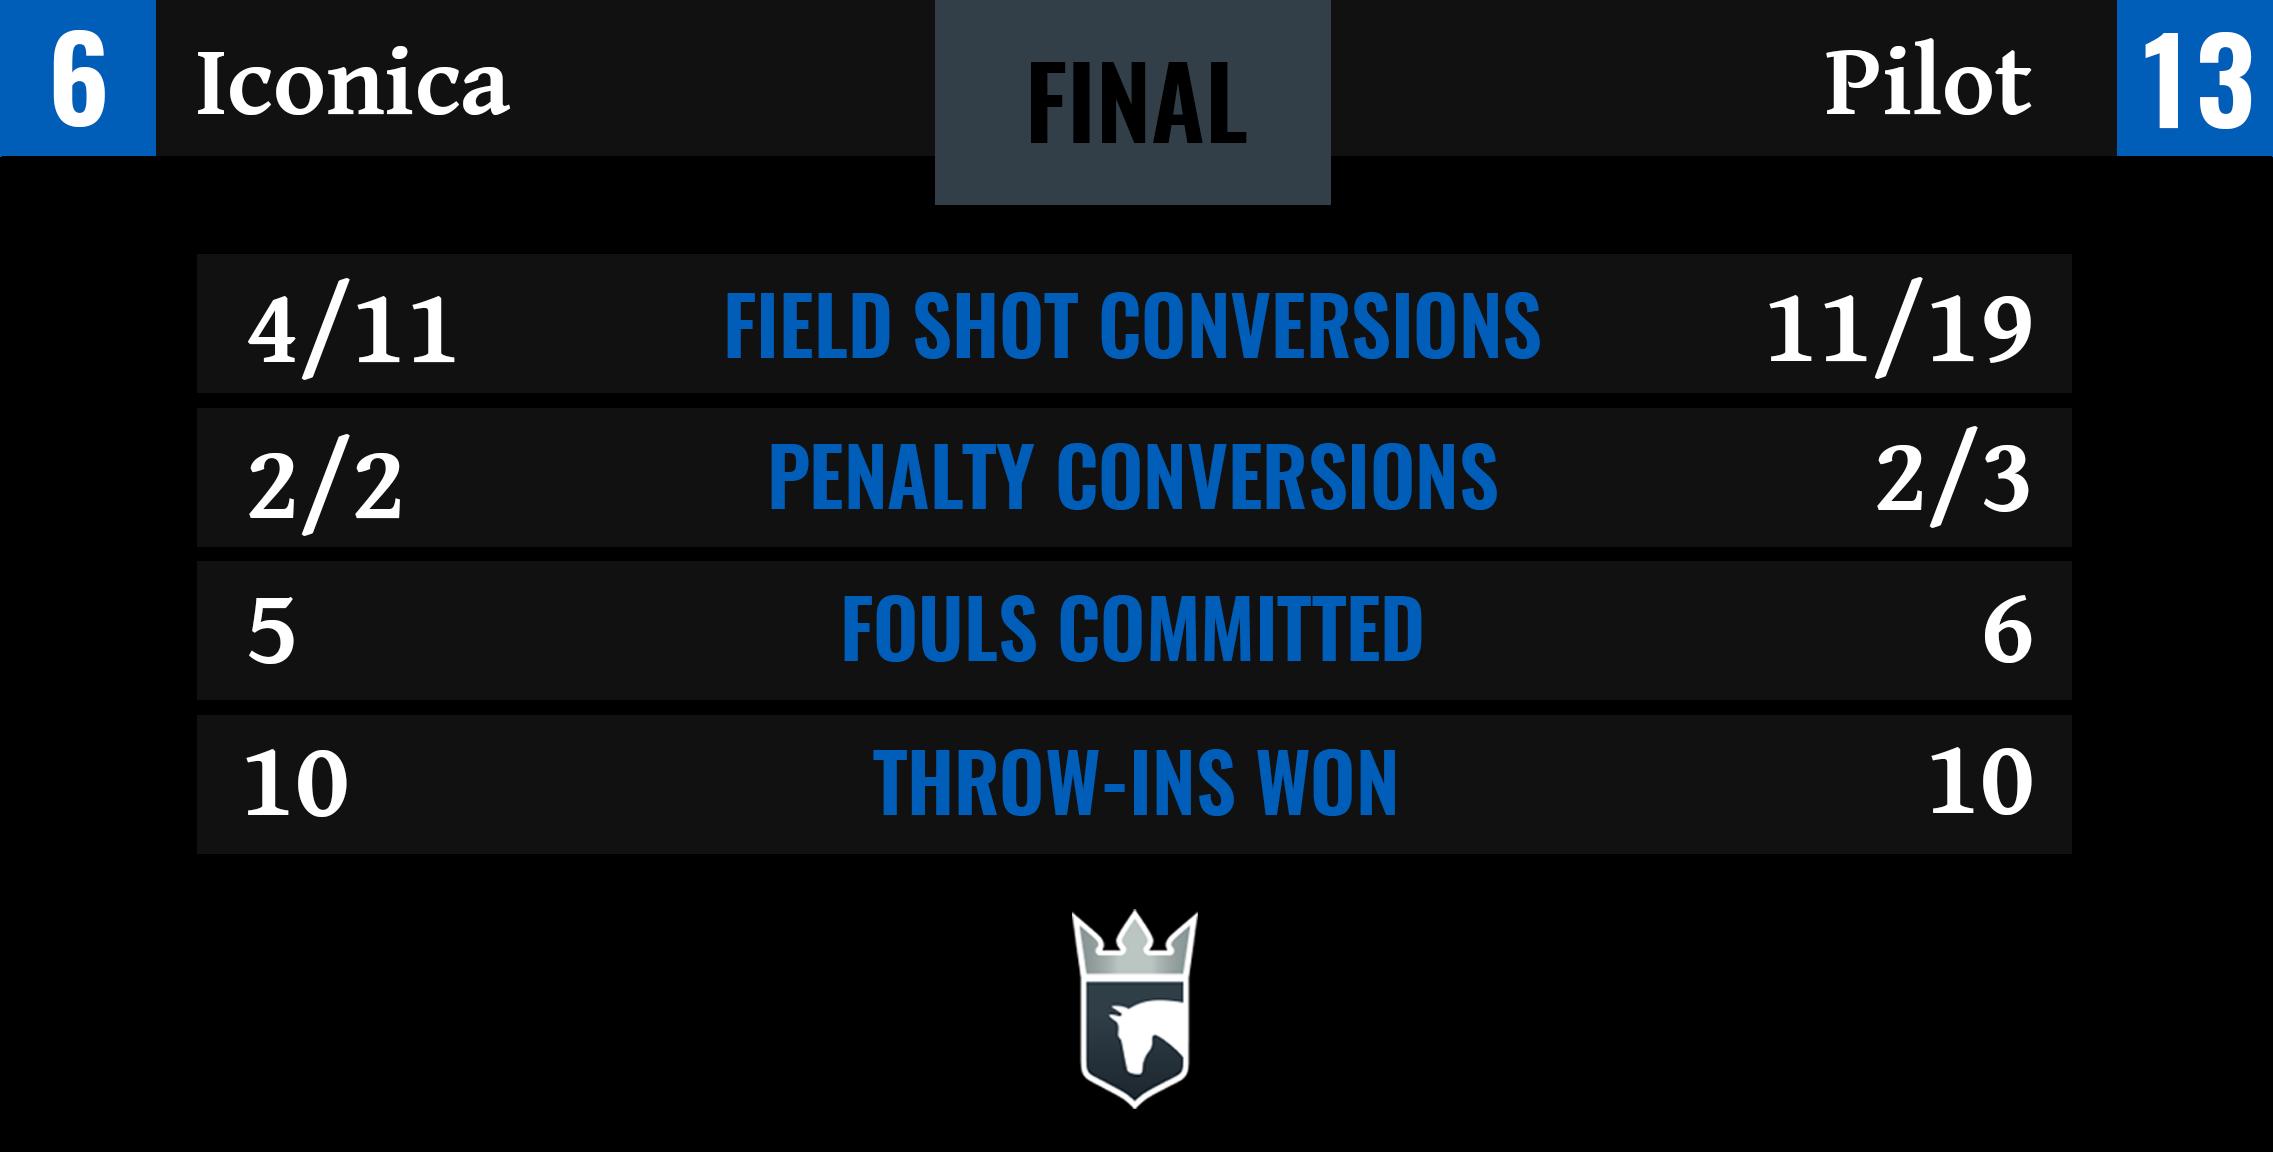 Iconica vs Pilot Final Stats